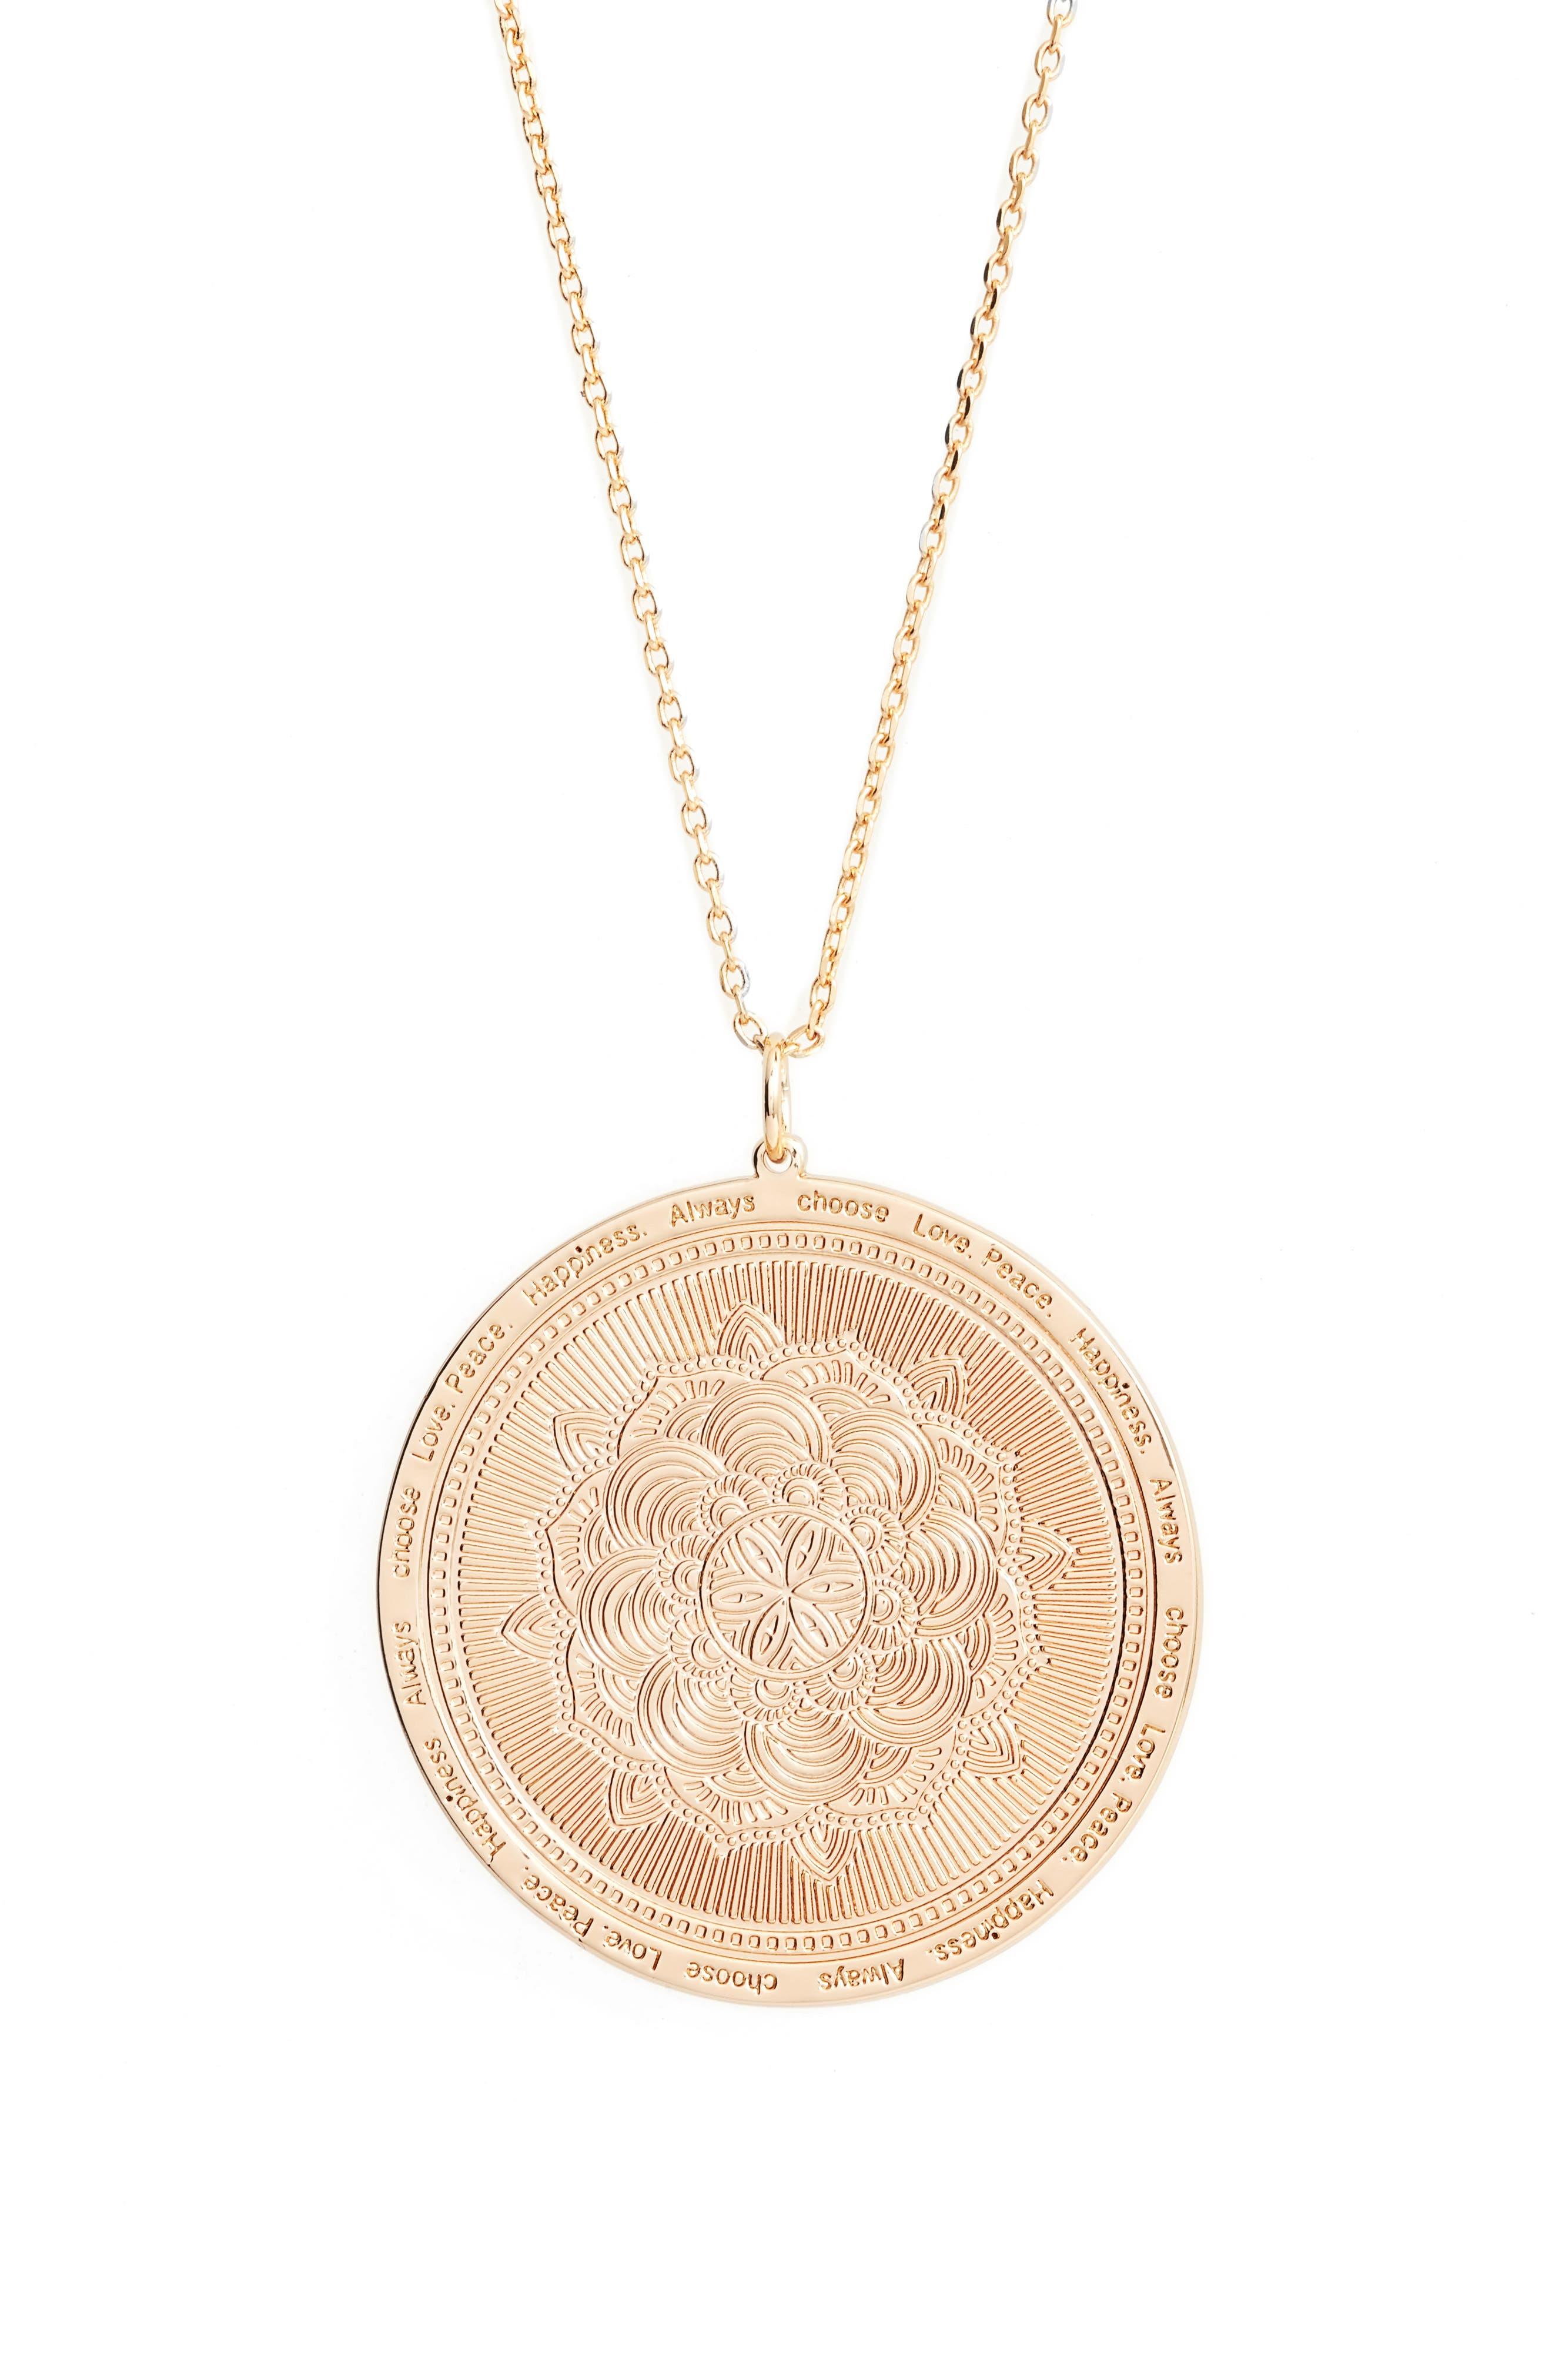 Always Choose Love Pendant Necklace,                             Main thumbnail 1, color,                             Rose Gold